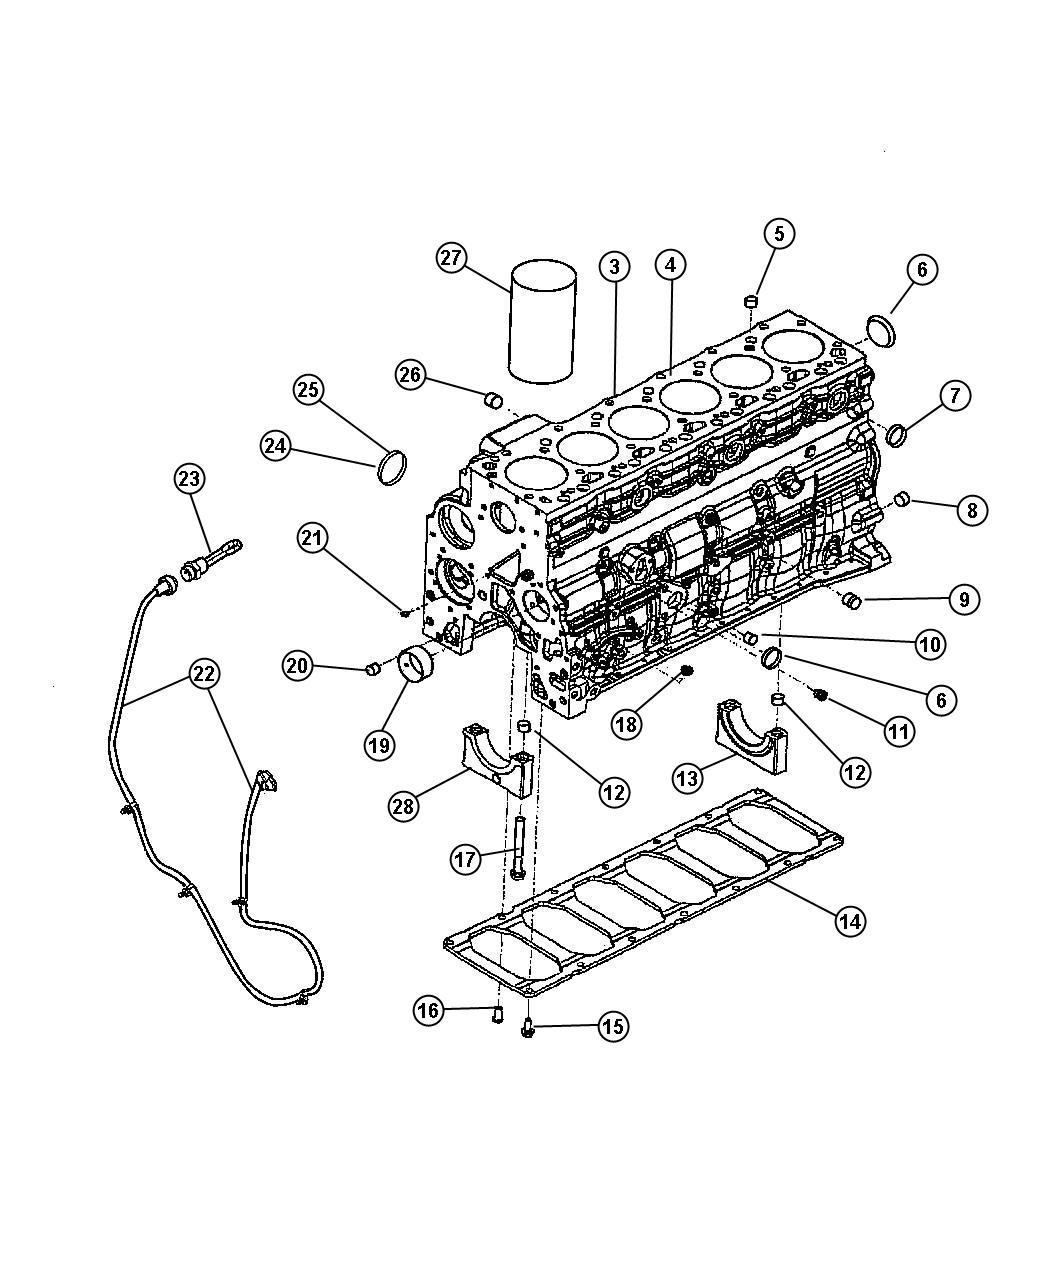 Dodge Ram Engine Complete Remanufactured